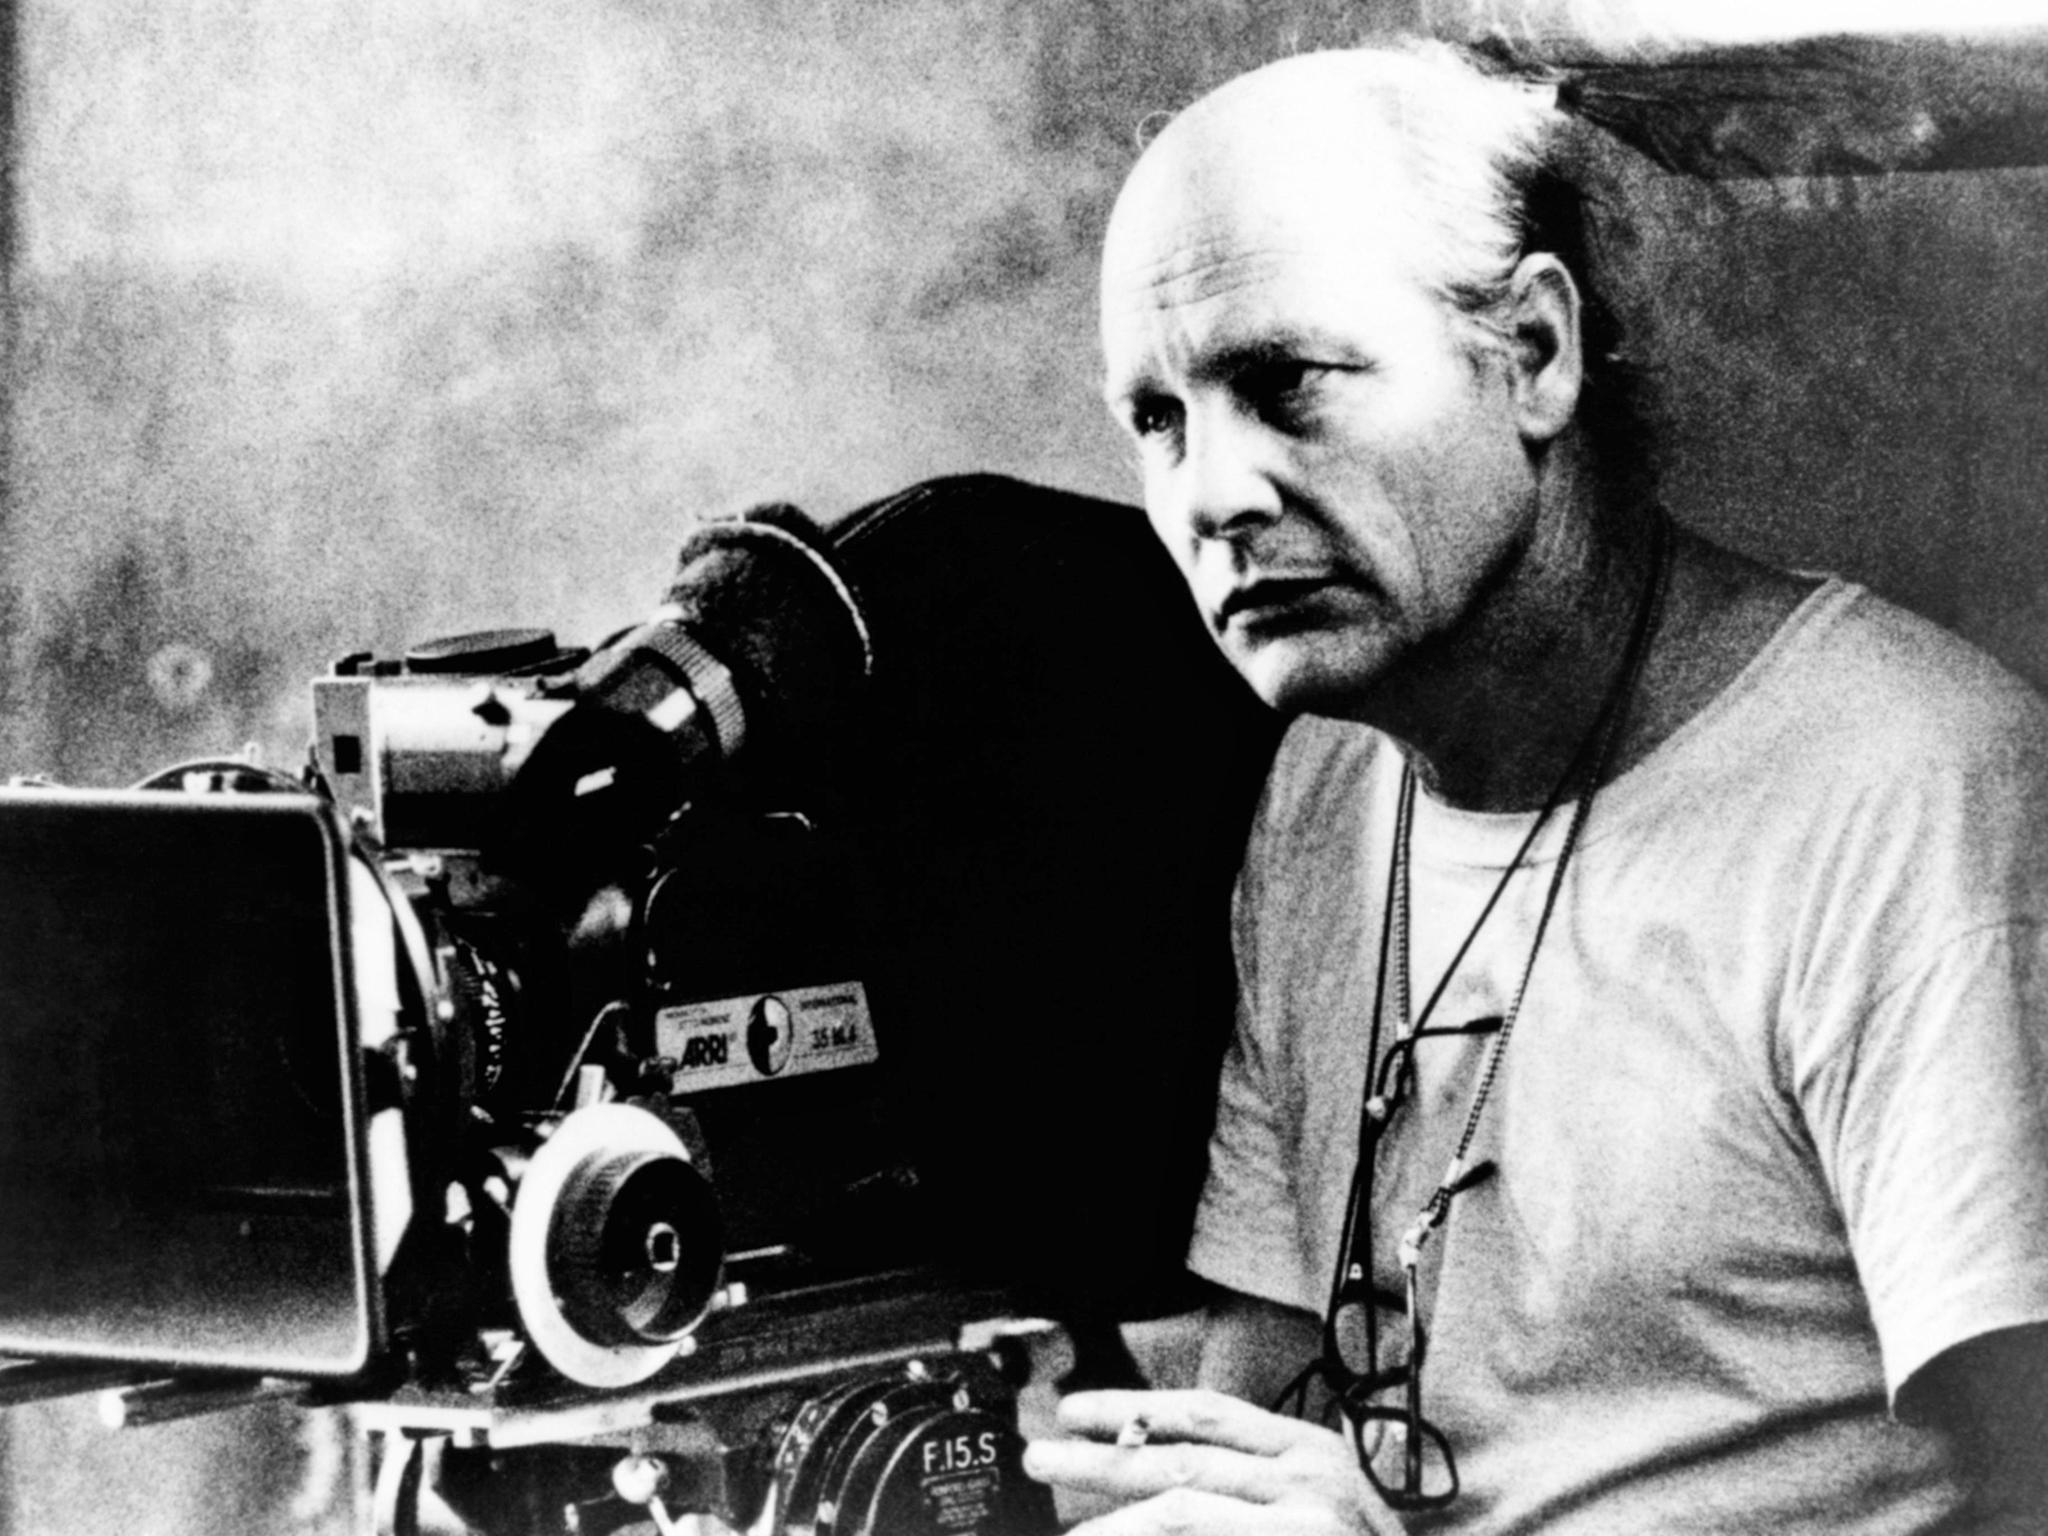 Robby Müller death: Cinematographer nicknamed 'master of light' dies aged 78